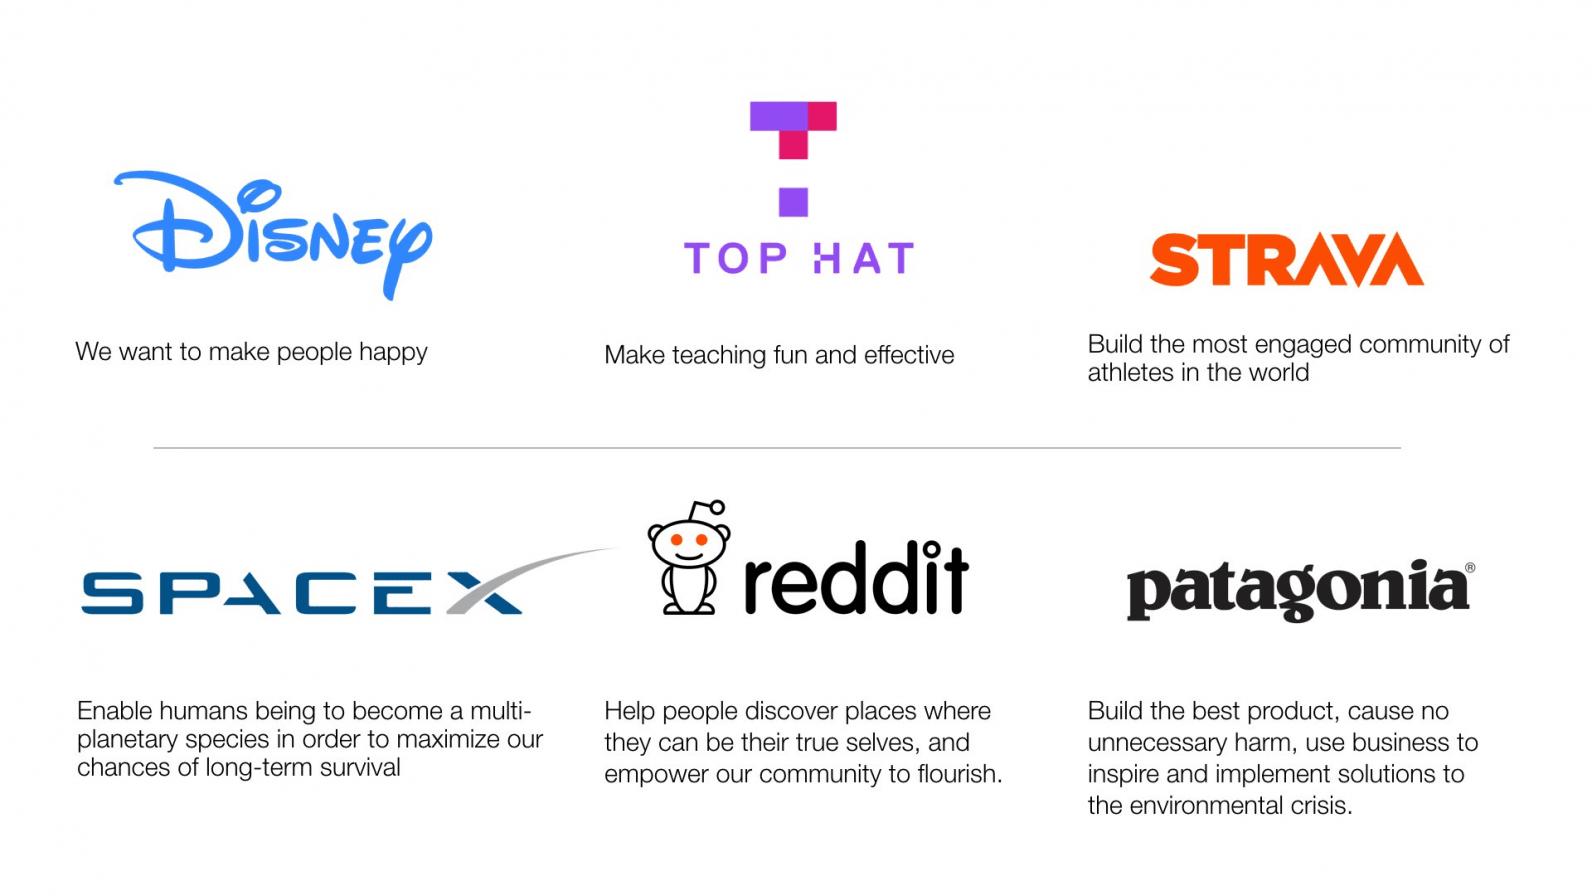 Reddit Darknet Package Seized